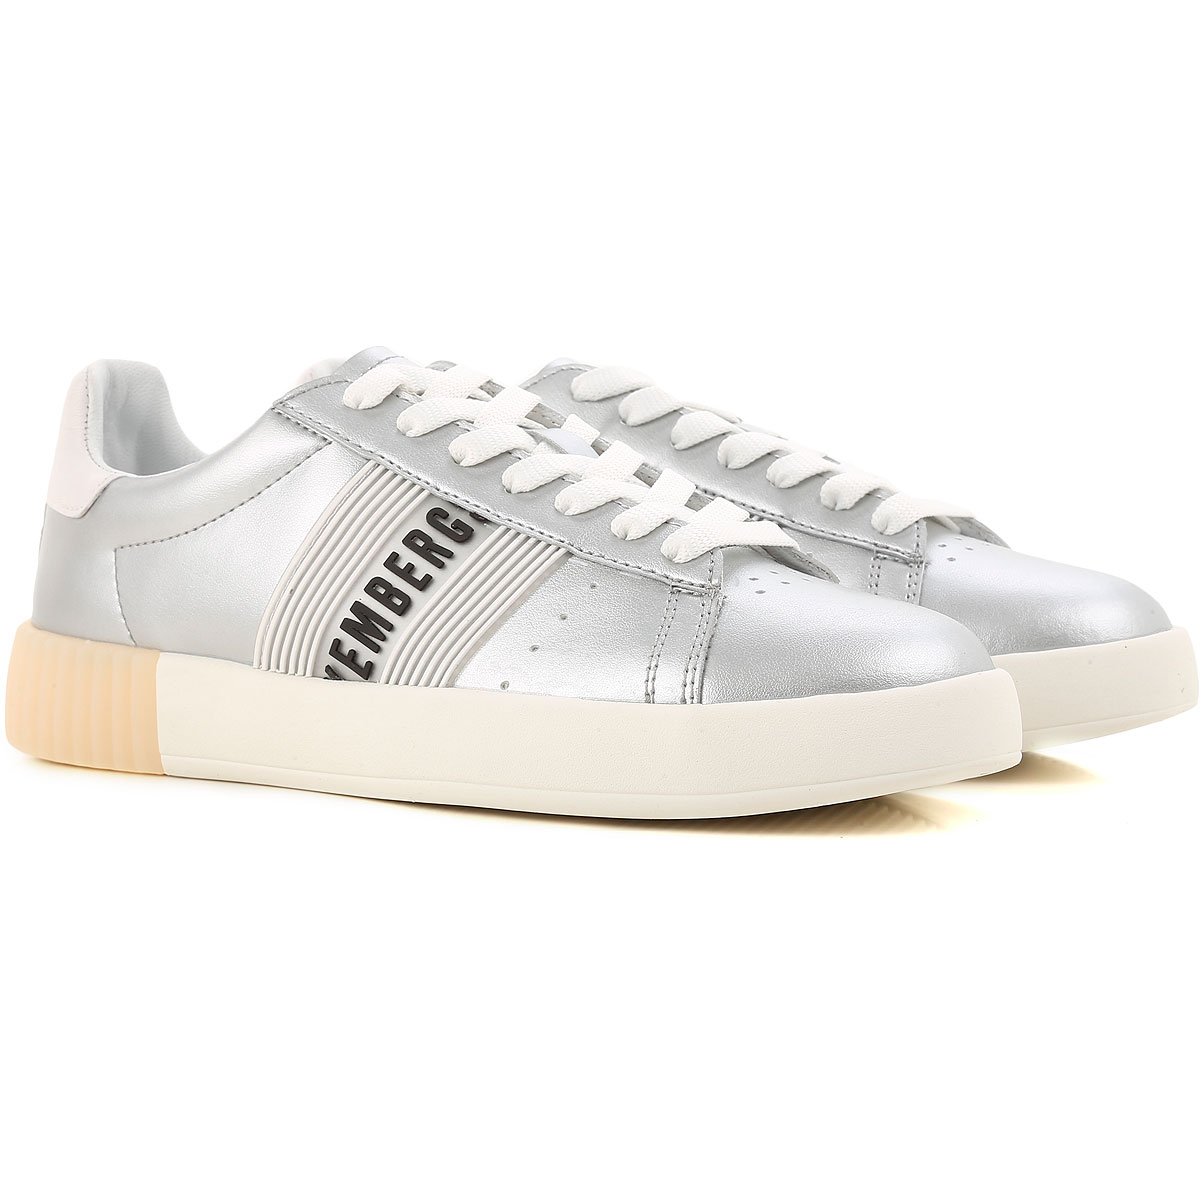 Dirk Bikkembergs Sneaker Femme Pas cher en Soldes, Argent, Cuir, 2017, 36 37 38 39 40